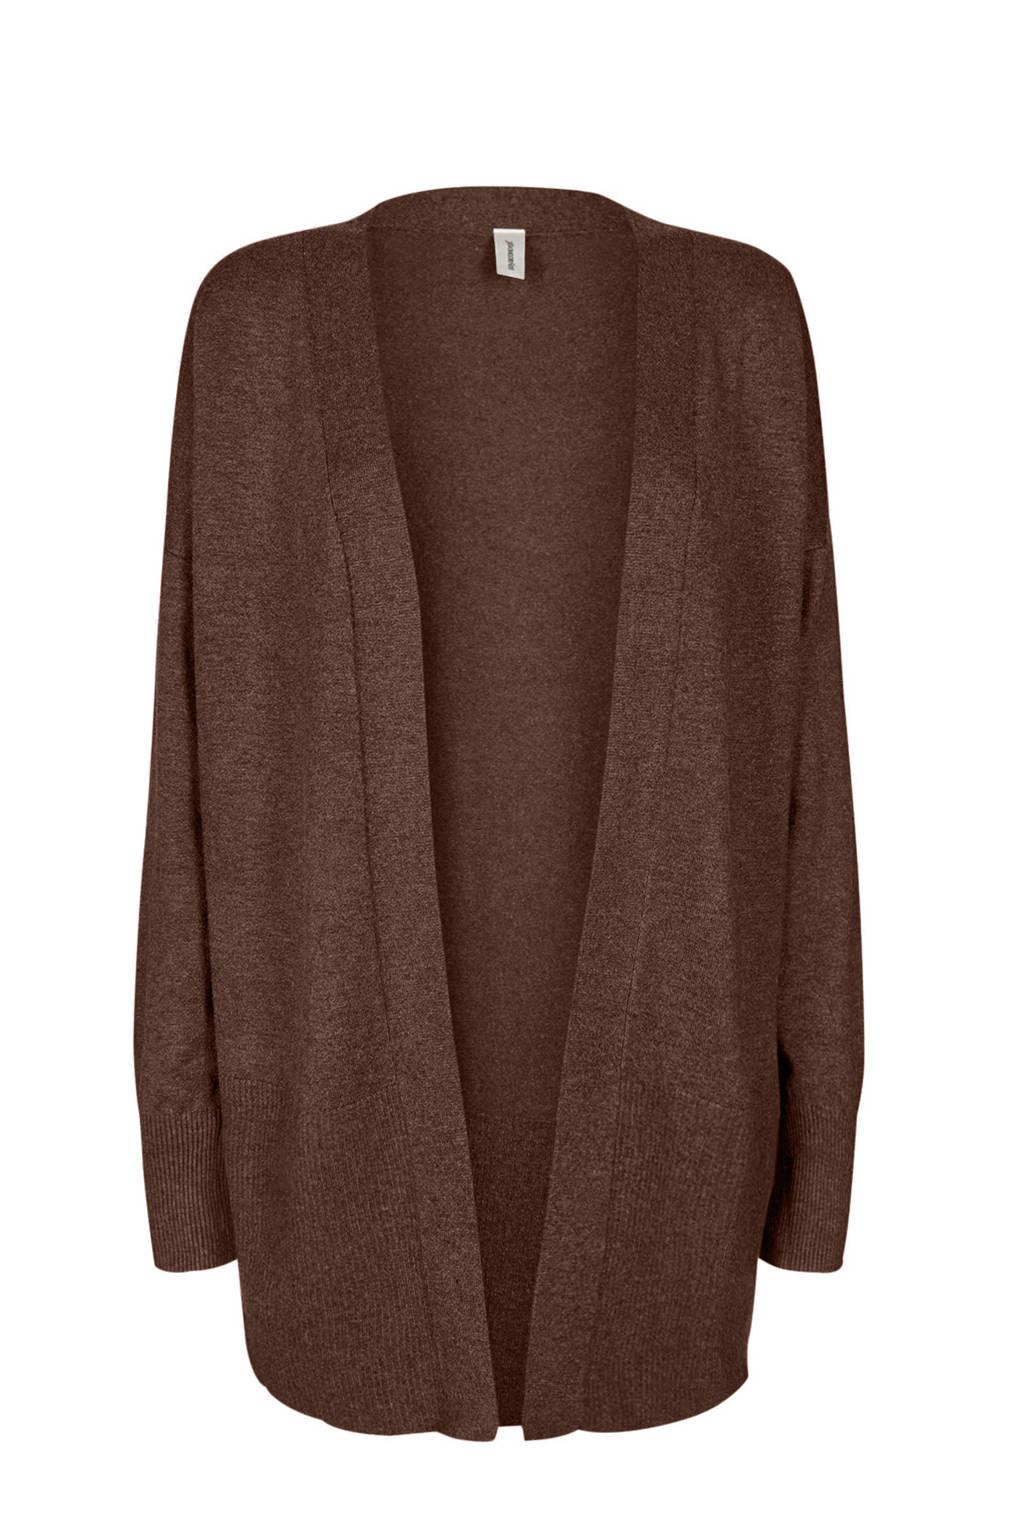 Soyaconcept vest bruin, Bruin